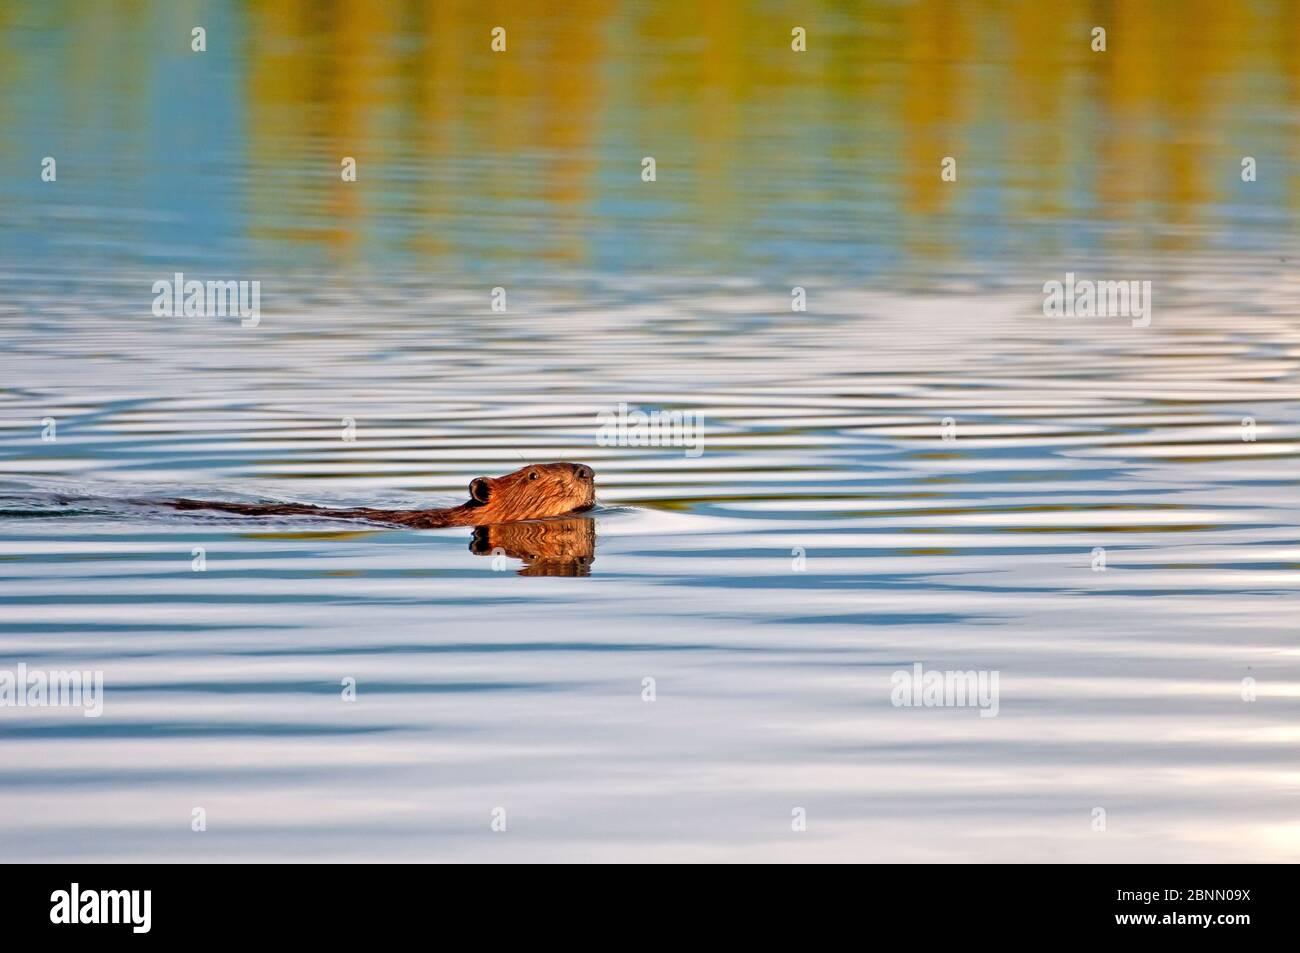 Beaver Swmit son lac d'origine, Alaska Banque D'Images